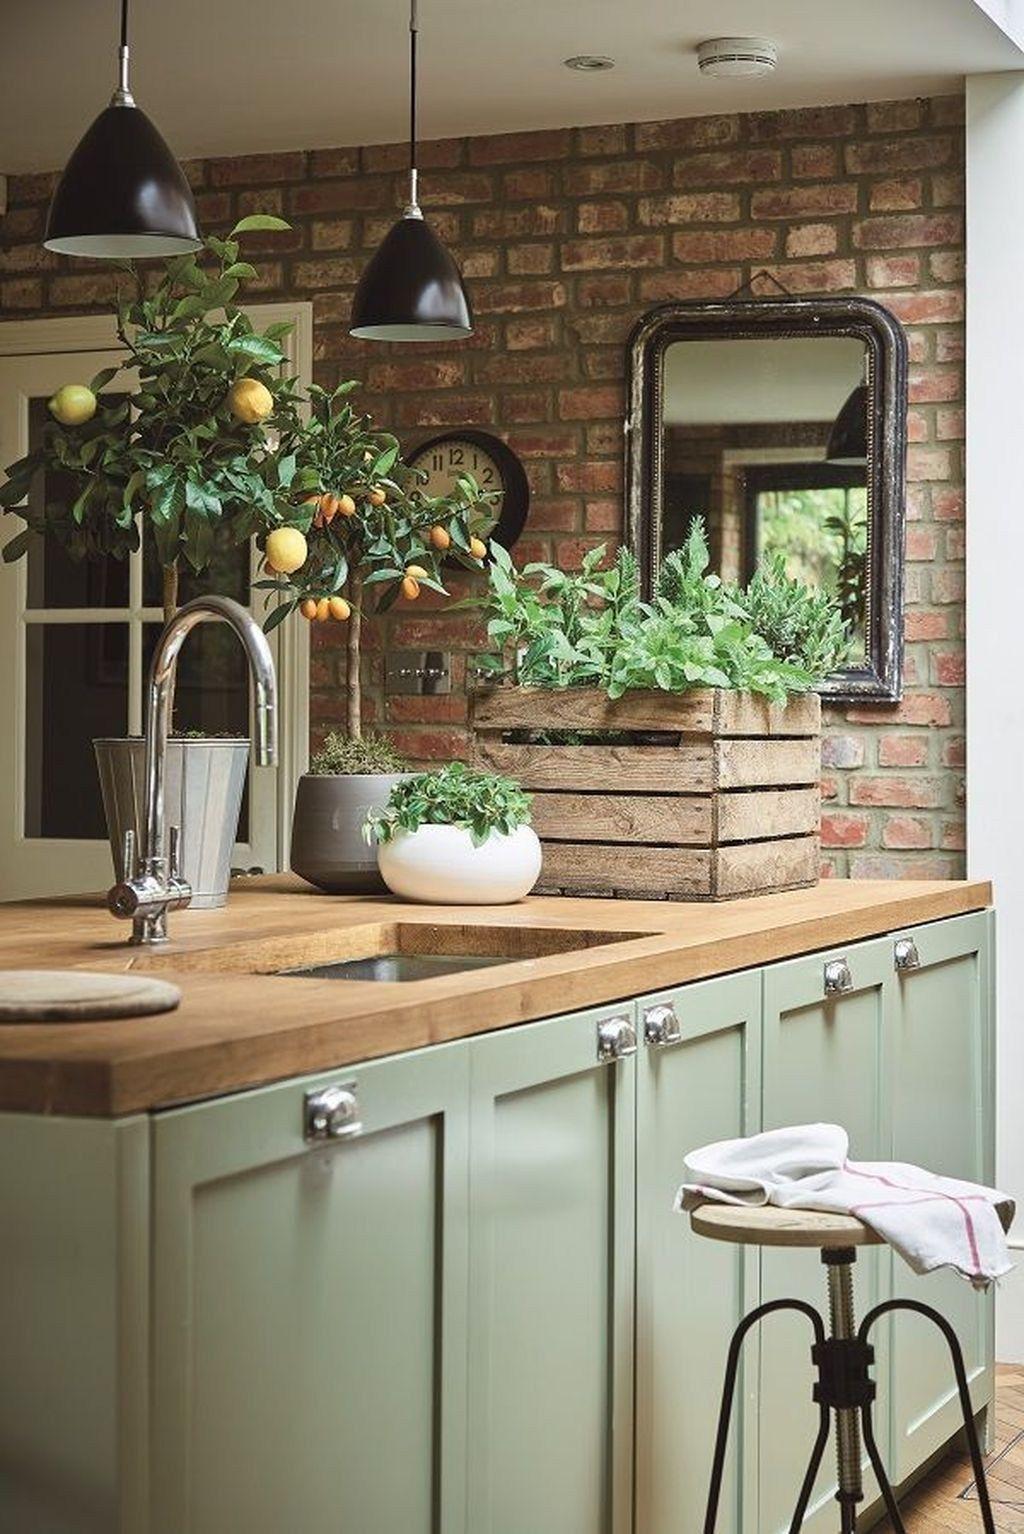 35 affordable farmhouse kitchen design ideas kitchen design rustic kitchen kitchen interior on kitchen cabinets rustic farmhouse style id=79435